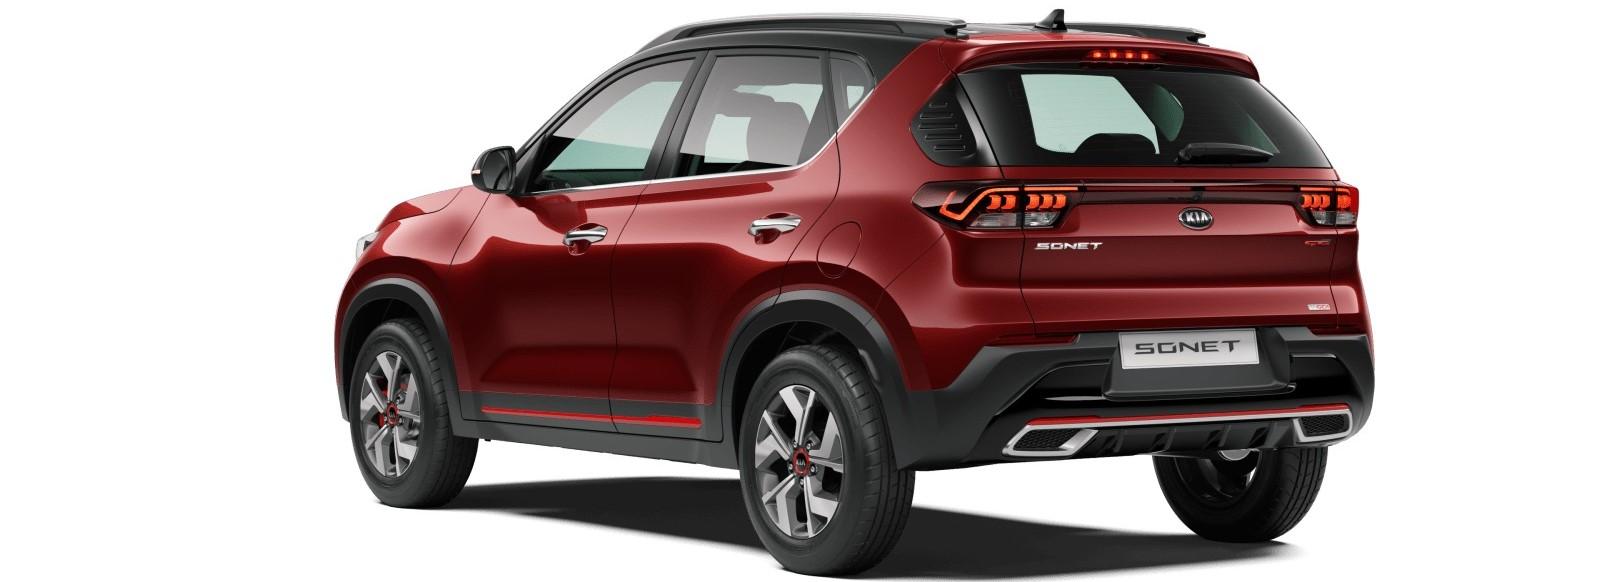 kia-sonet-red-rear-design